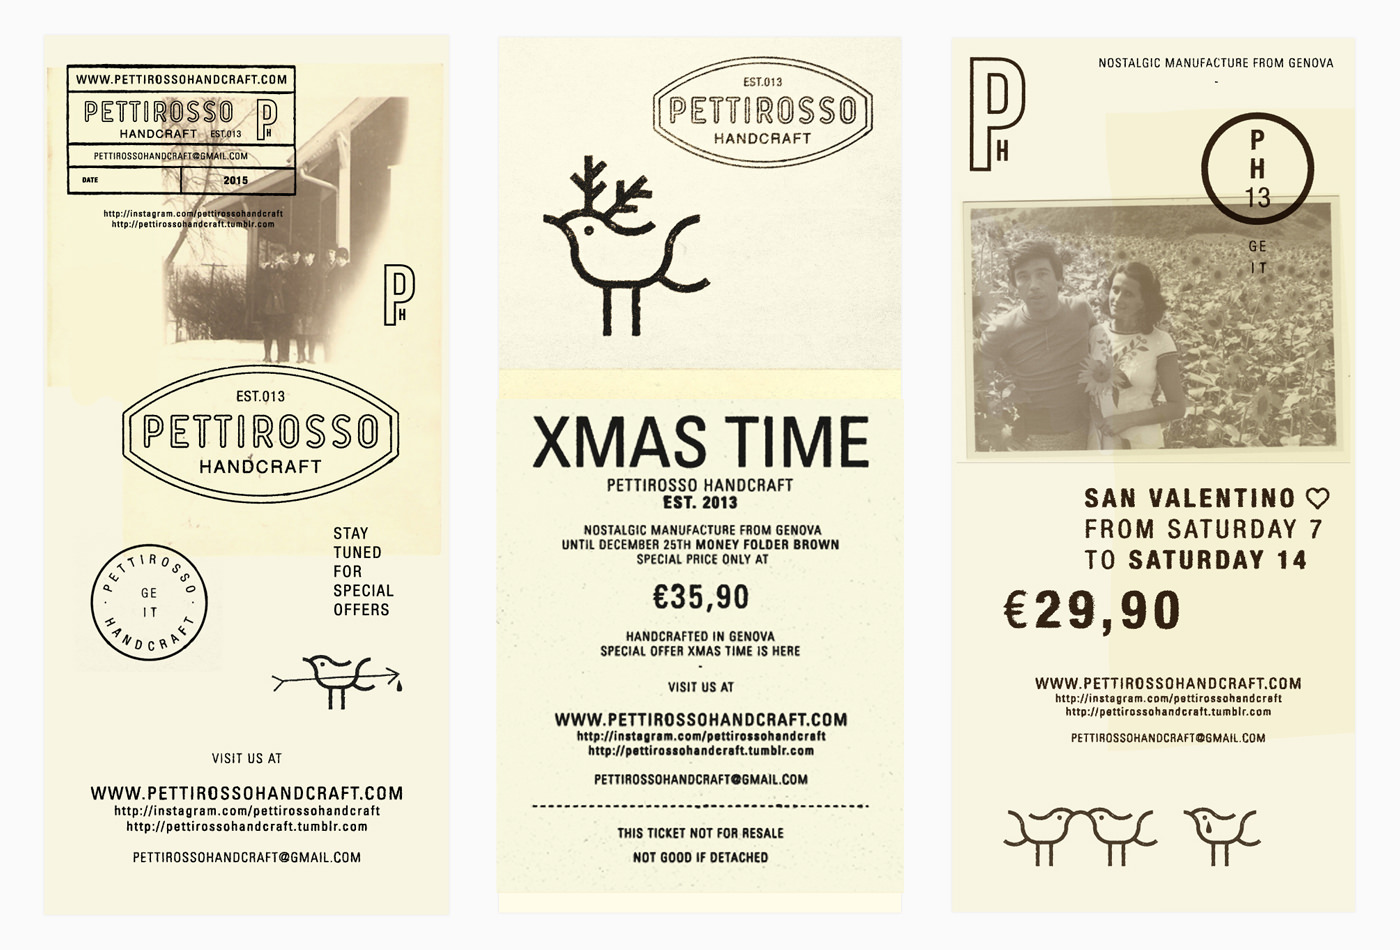 09-advs-pettirosso-handcraft-branding-art-direction-vacaliebres